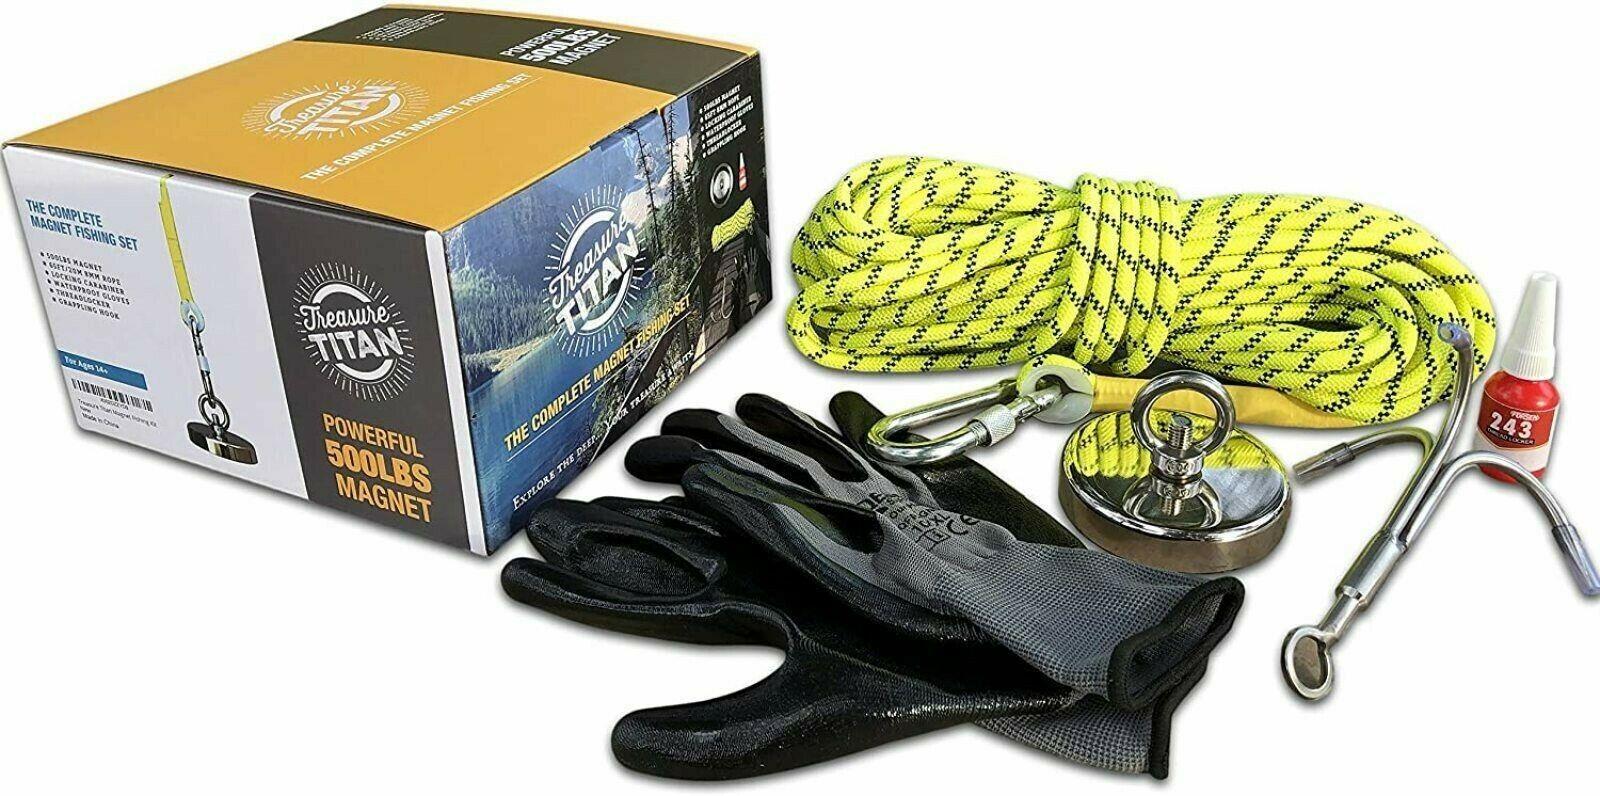 Treasure Titan Complete Magnet Fishing Kit 500LB Pull Force Strong Neodymium - $65.95